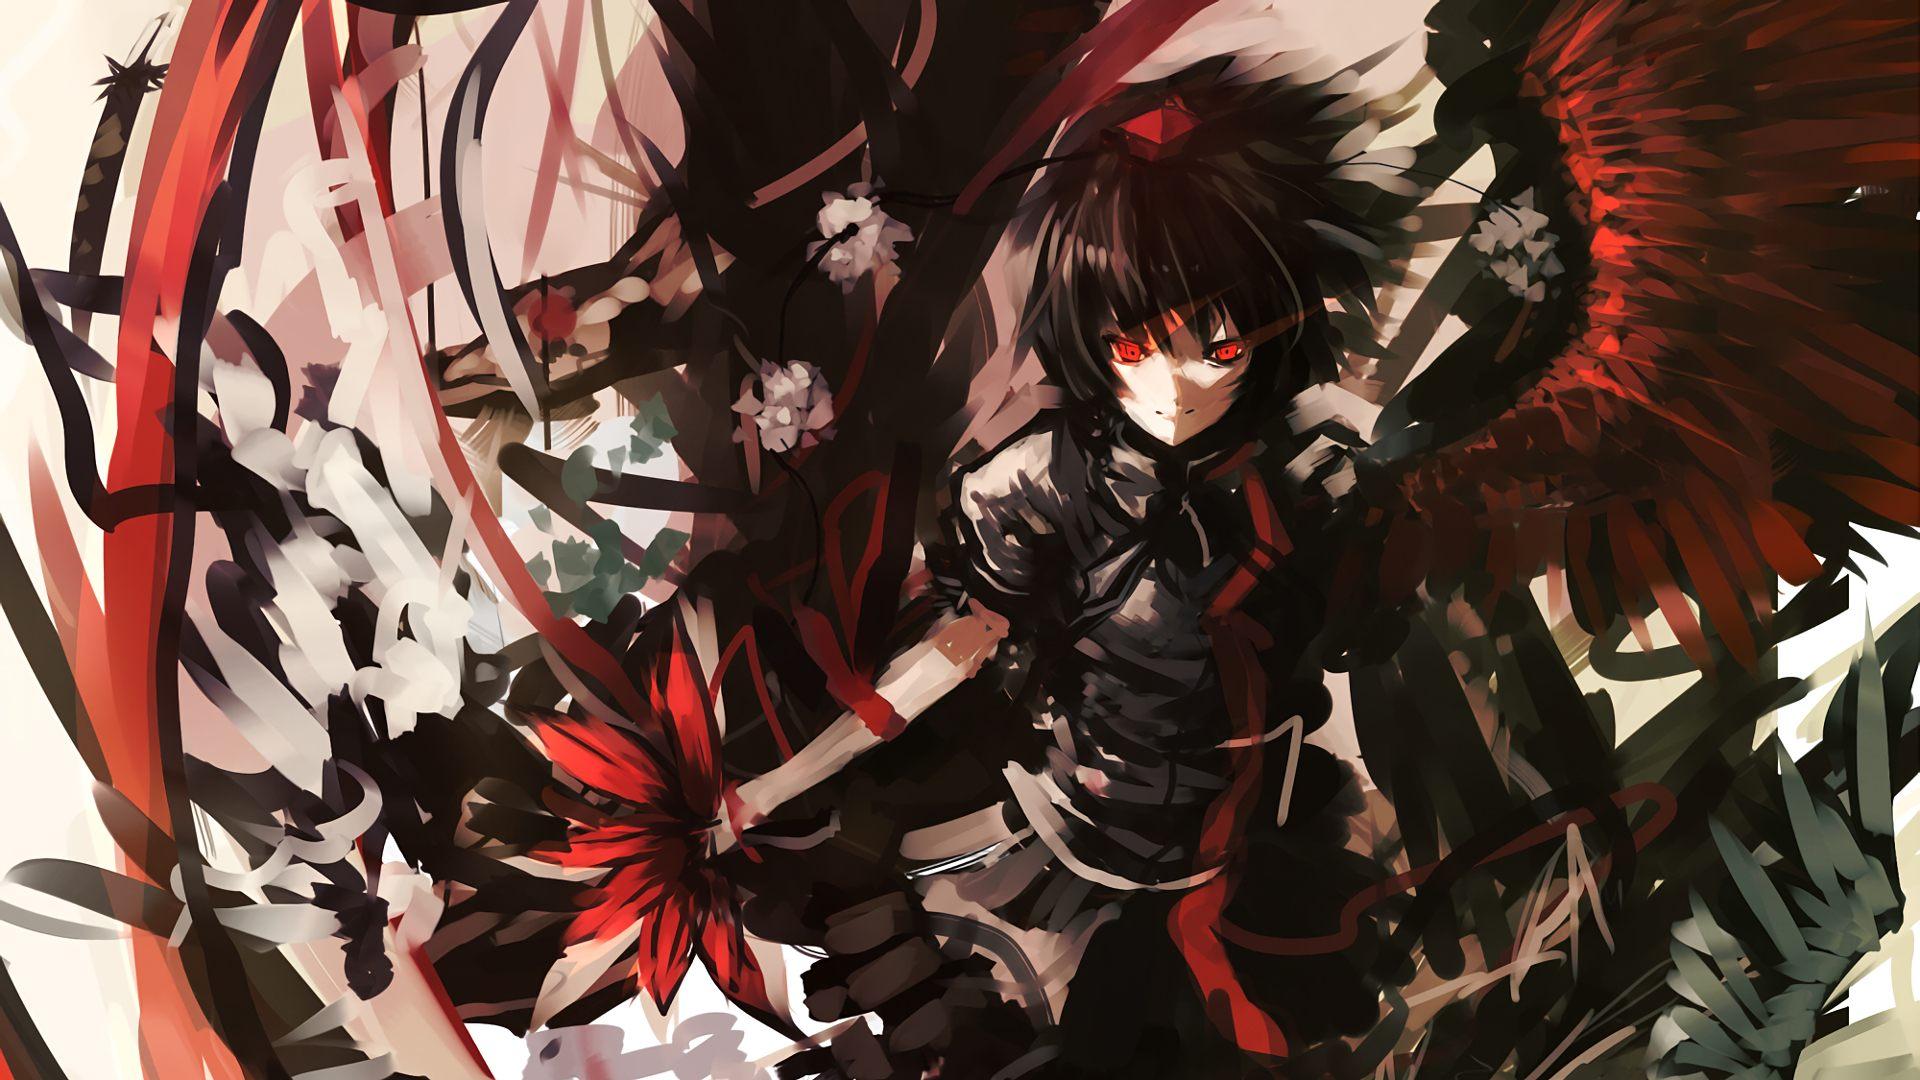 Mobile Anime Wallpapers Group 34